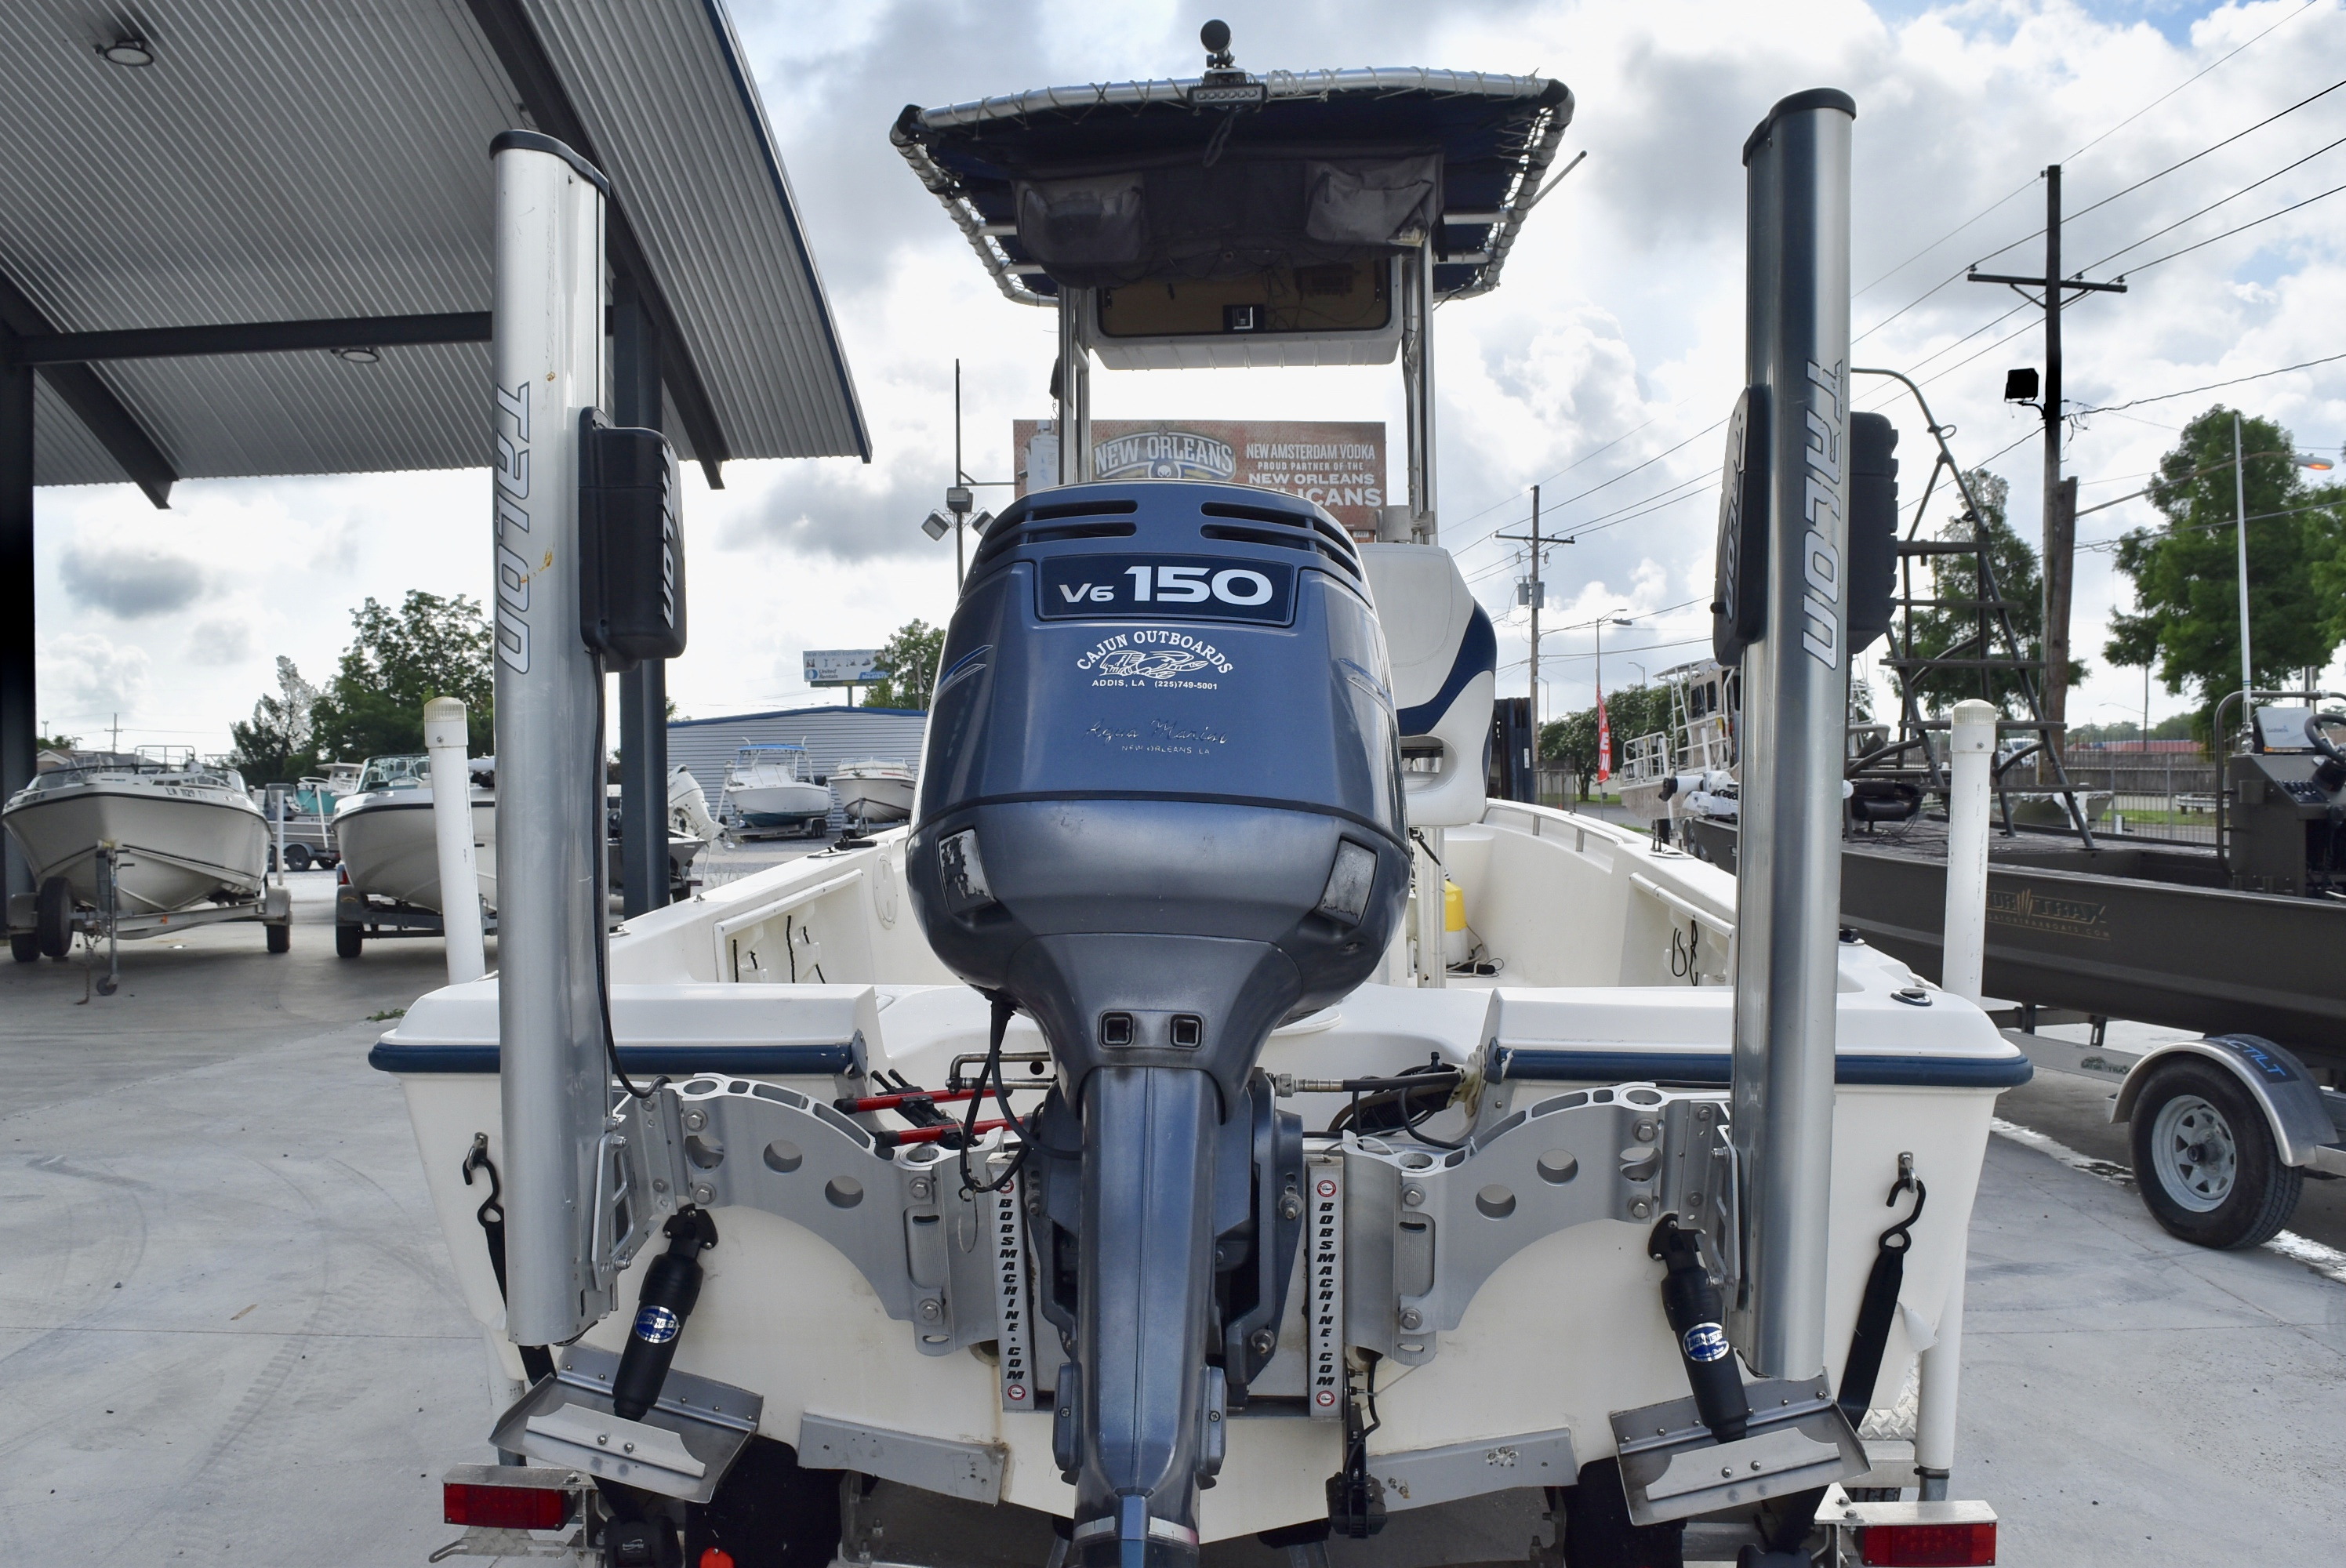 2002 Sea Hunt boat for sale, model of the boat is Navigator 20 & Image # 6 of 7